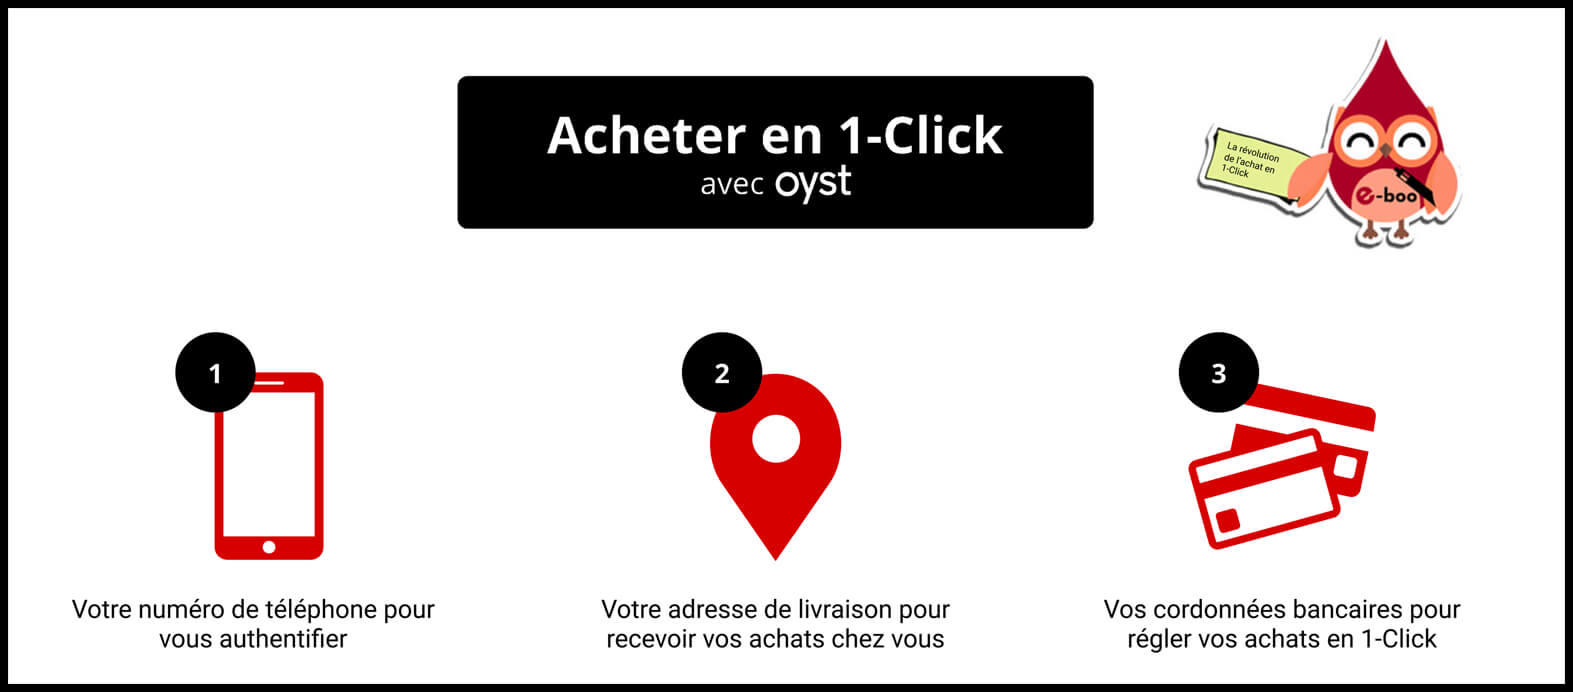 achat-1-click-avec-oyst